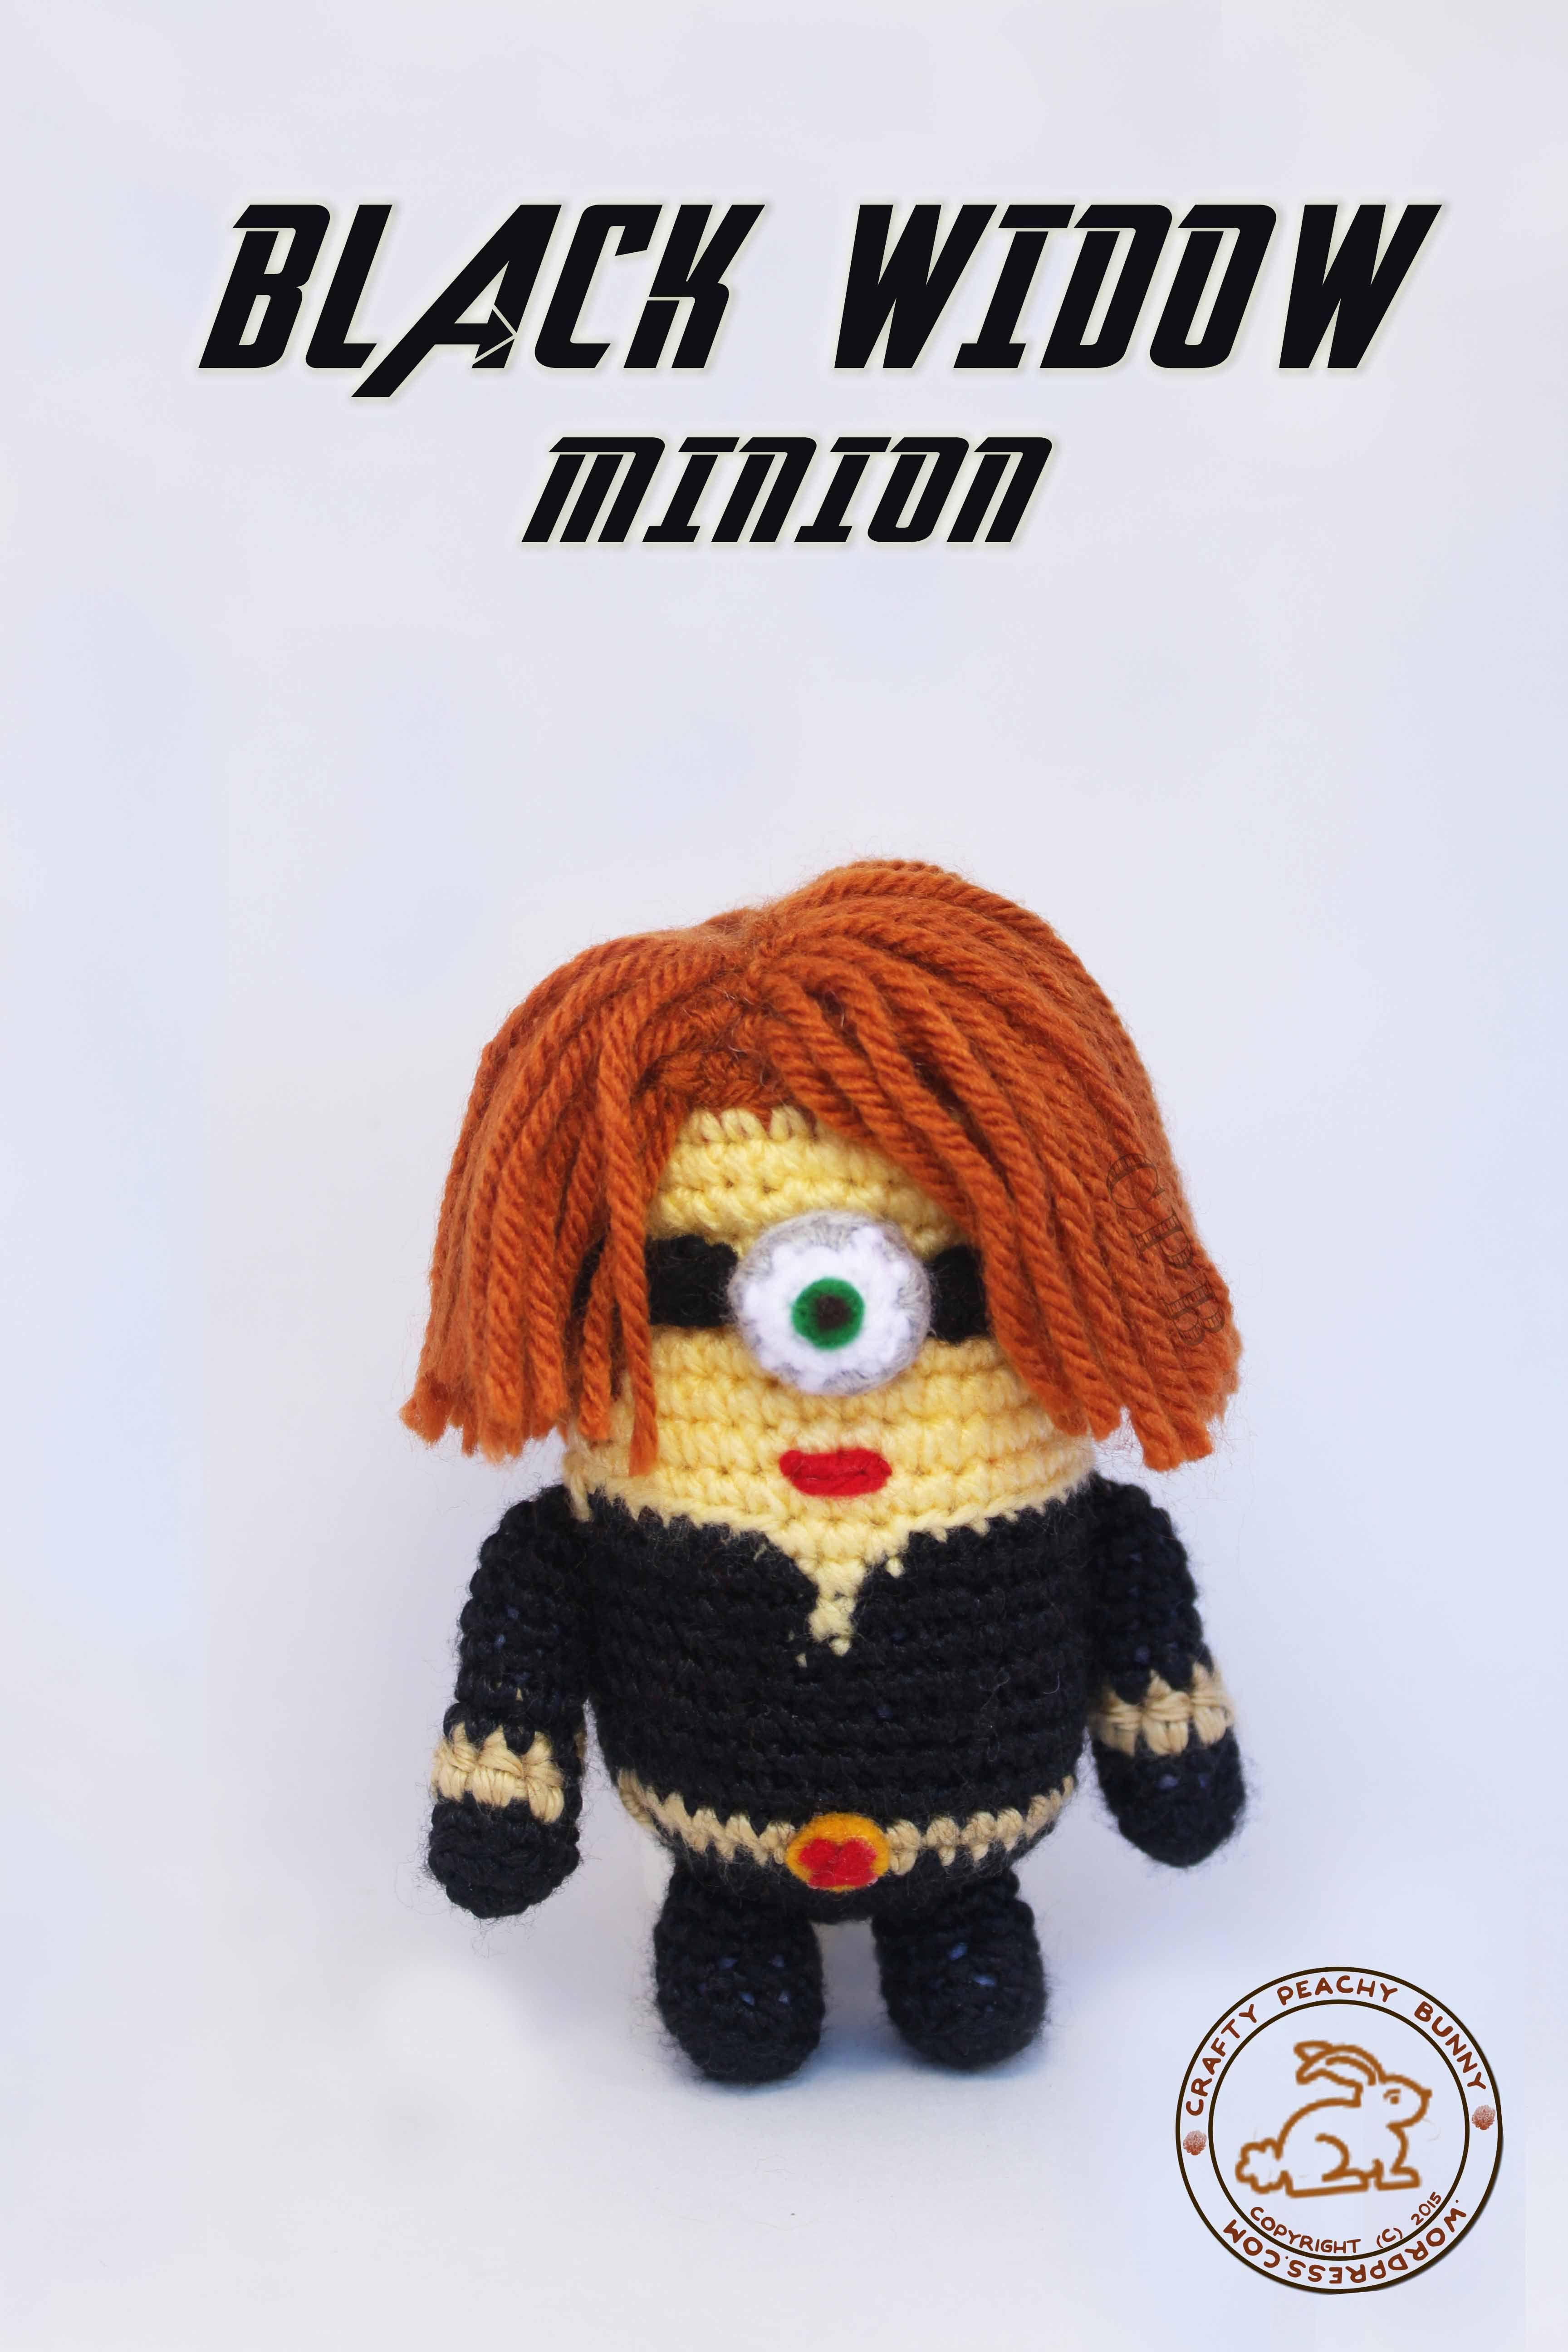 Black Widow Minion